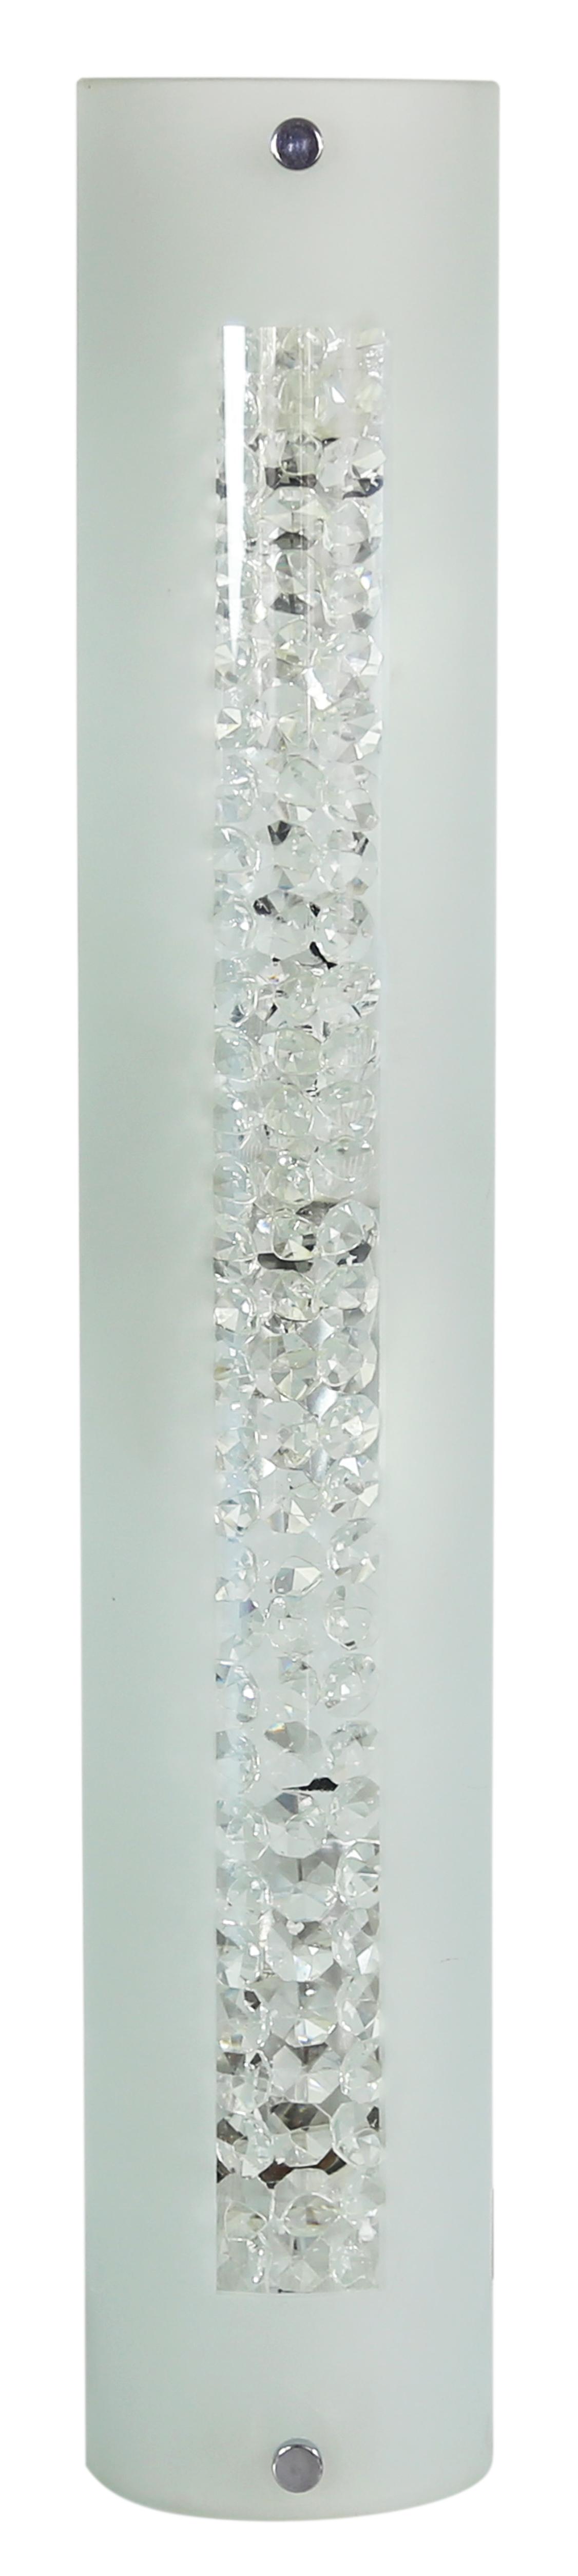 ABREGO LAMPA SUFITOWA PLAFON 52/10 3X60W E27 - 10-28624